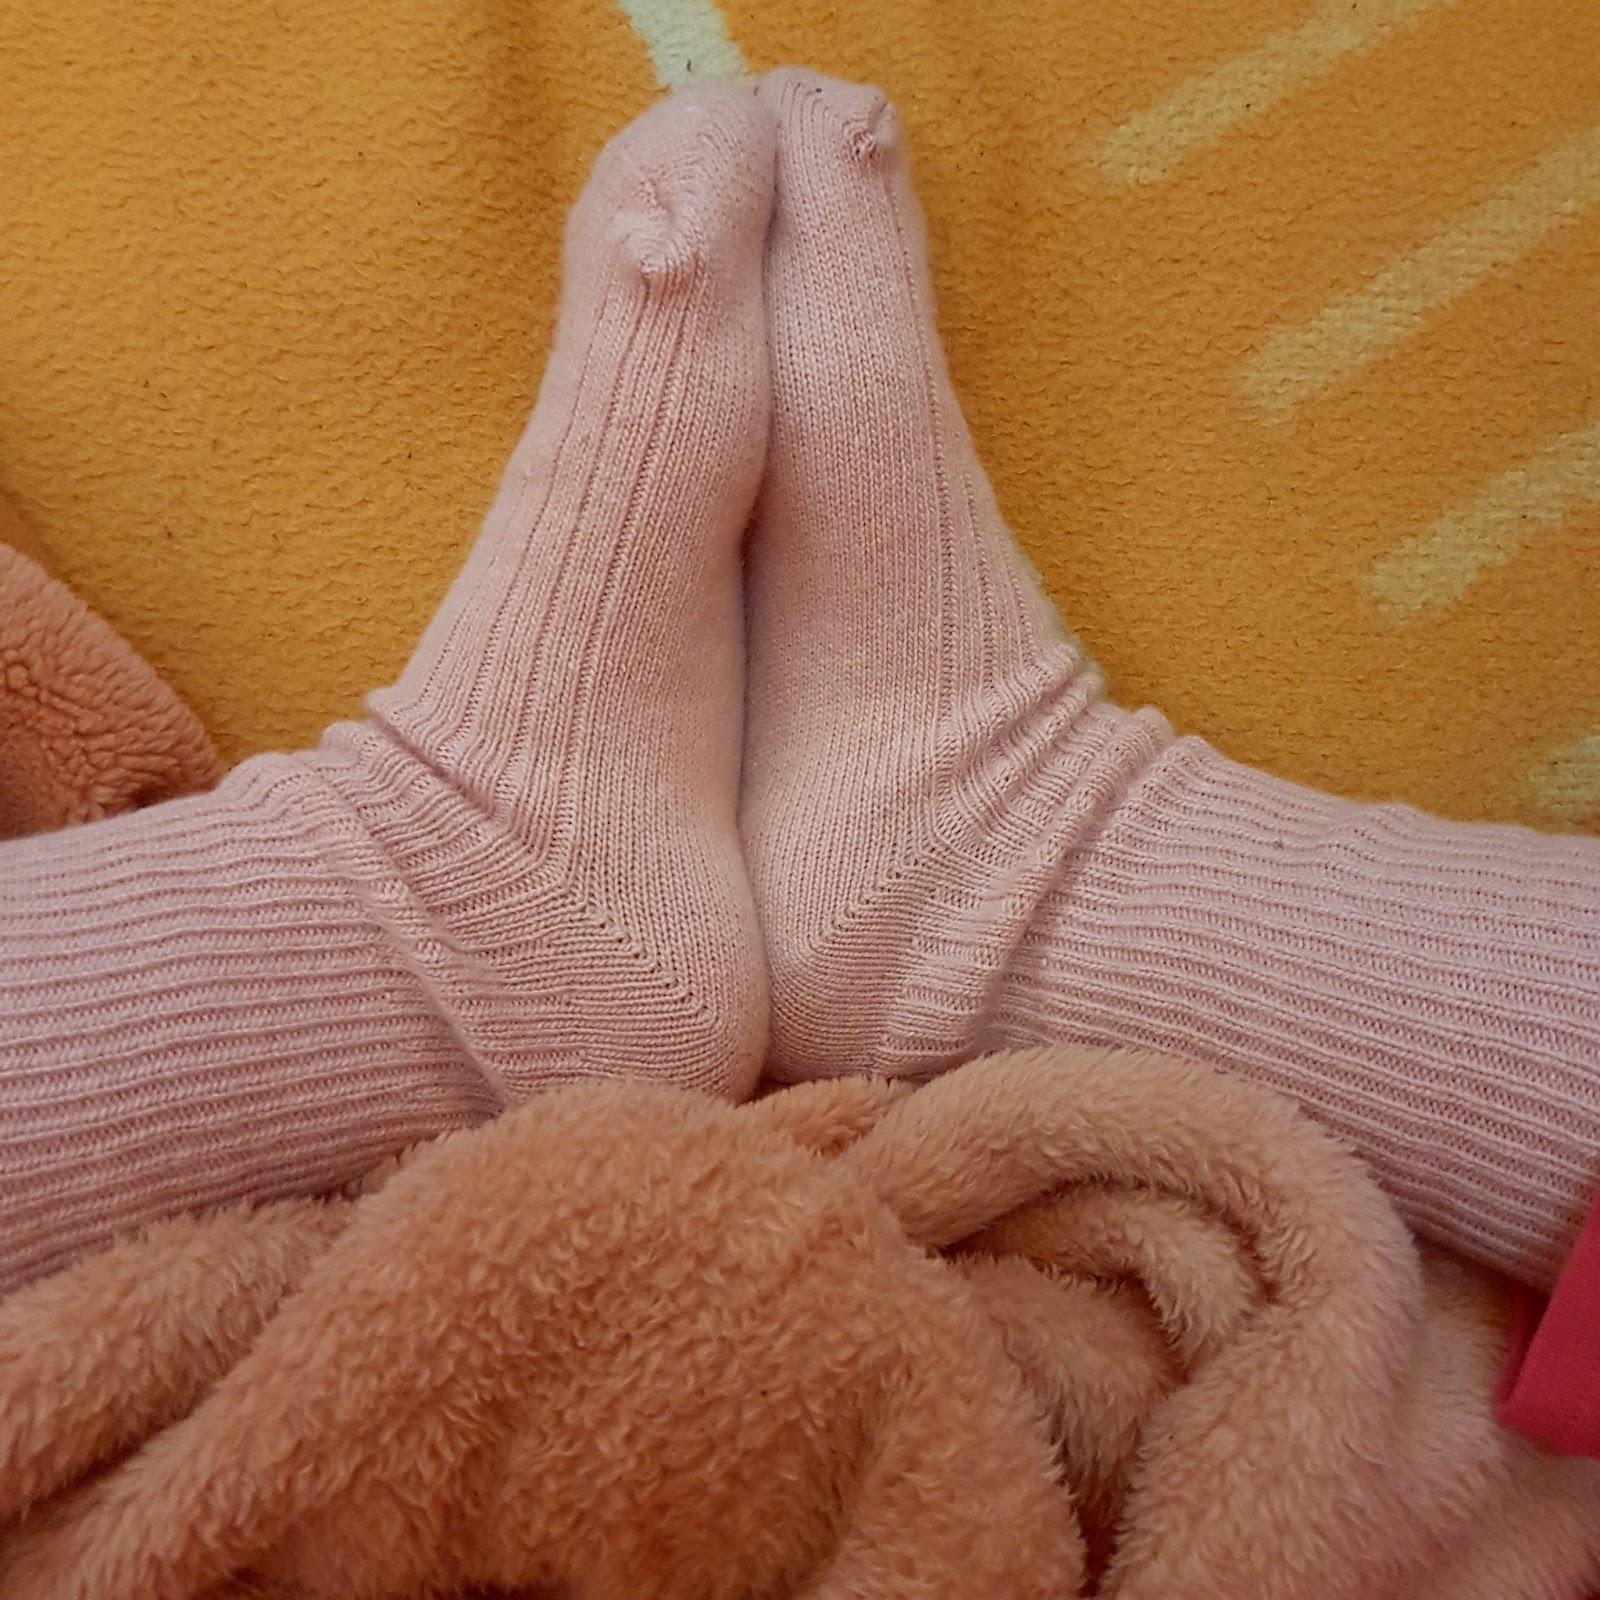 Omiljene vunene čarape